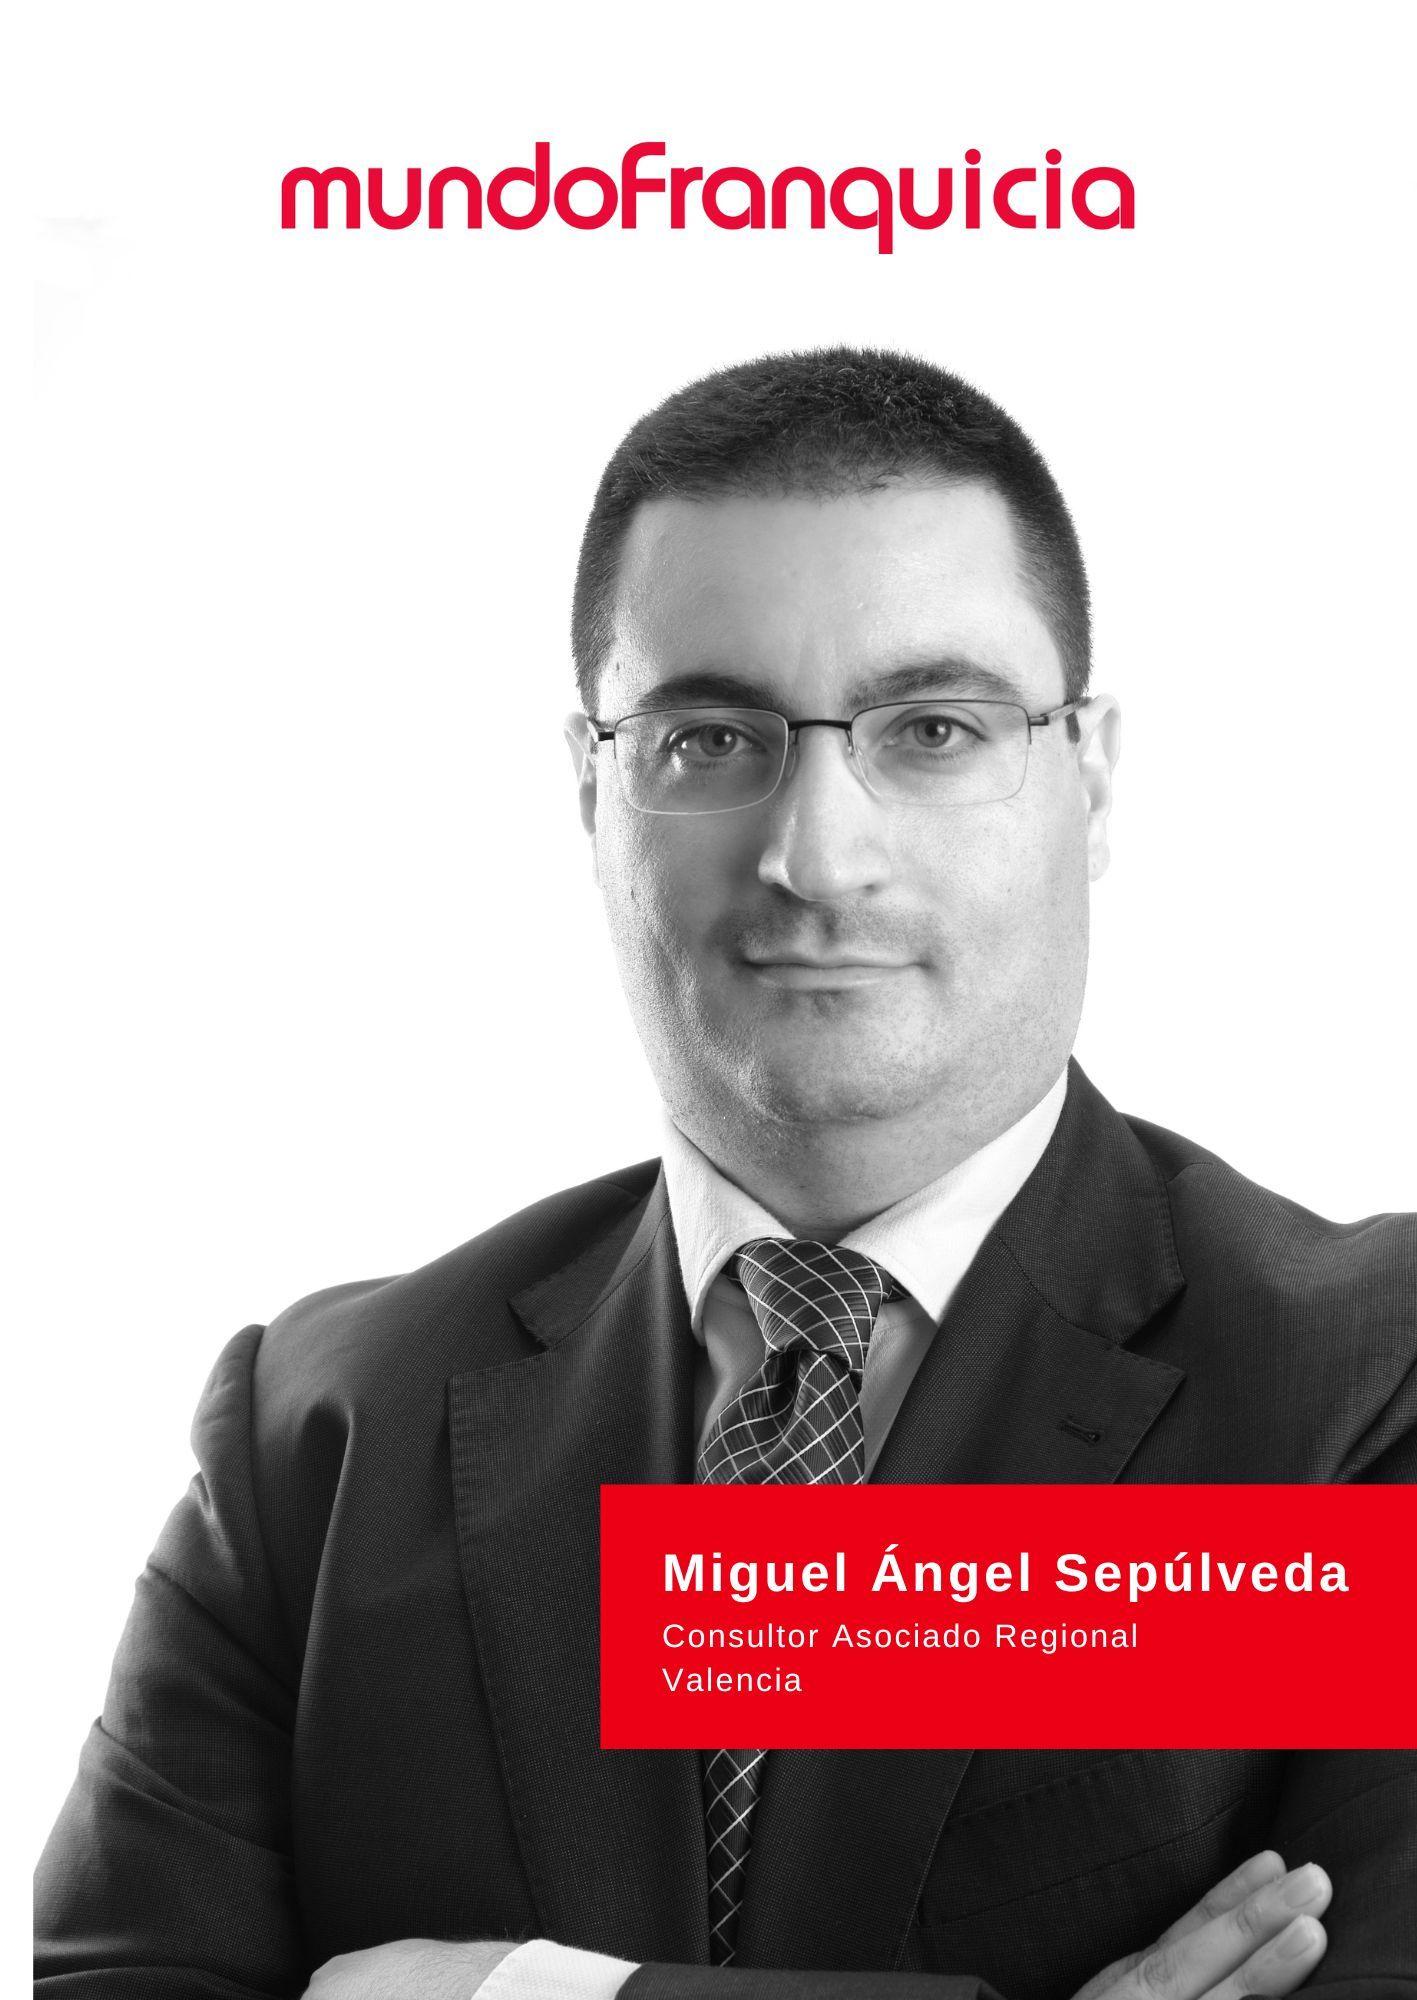 Miguel Ángel Sepúlveda